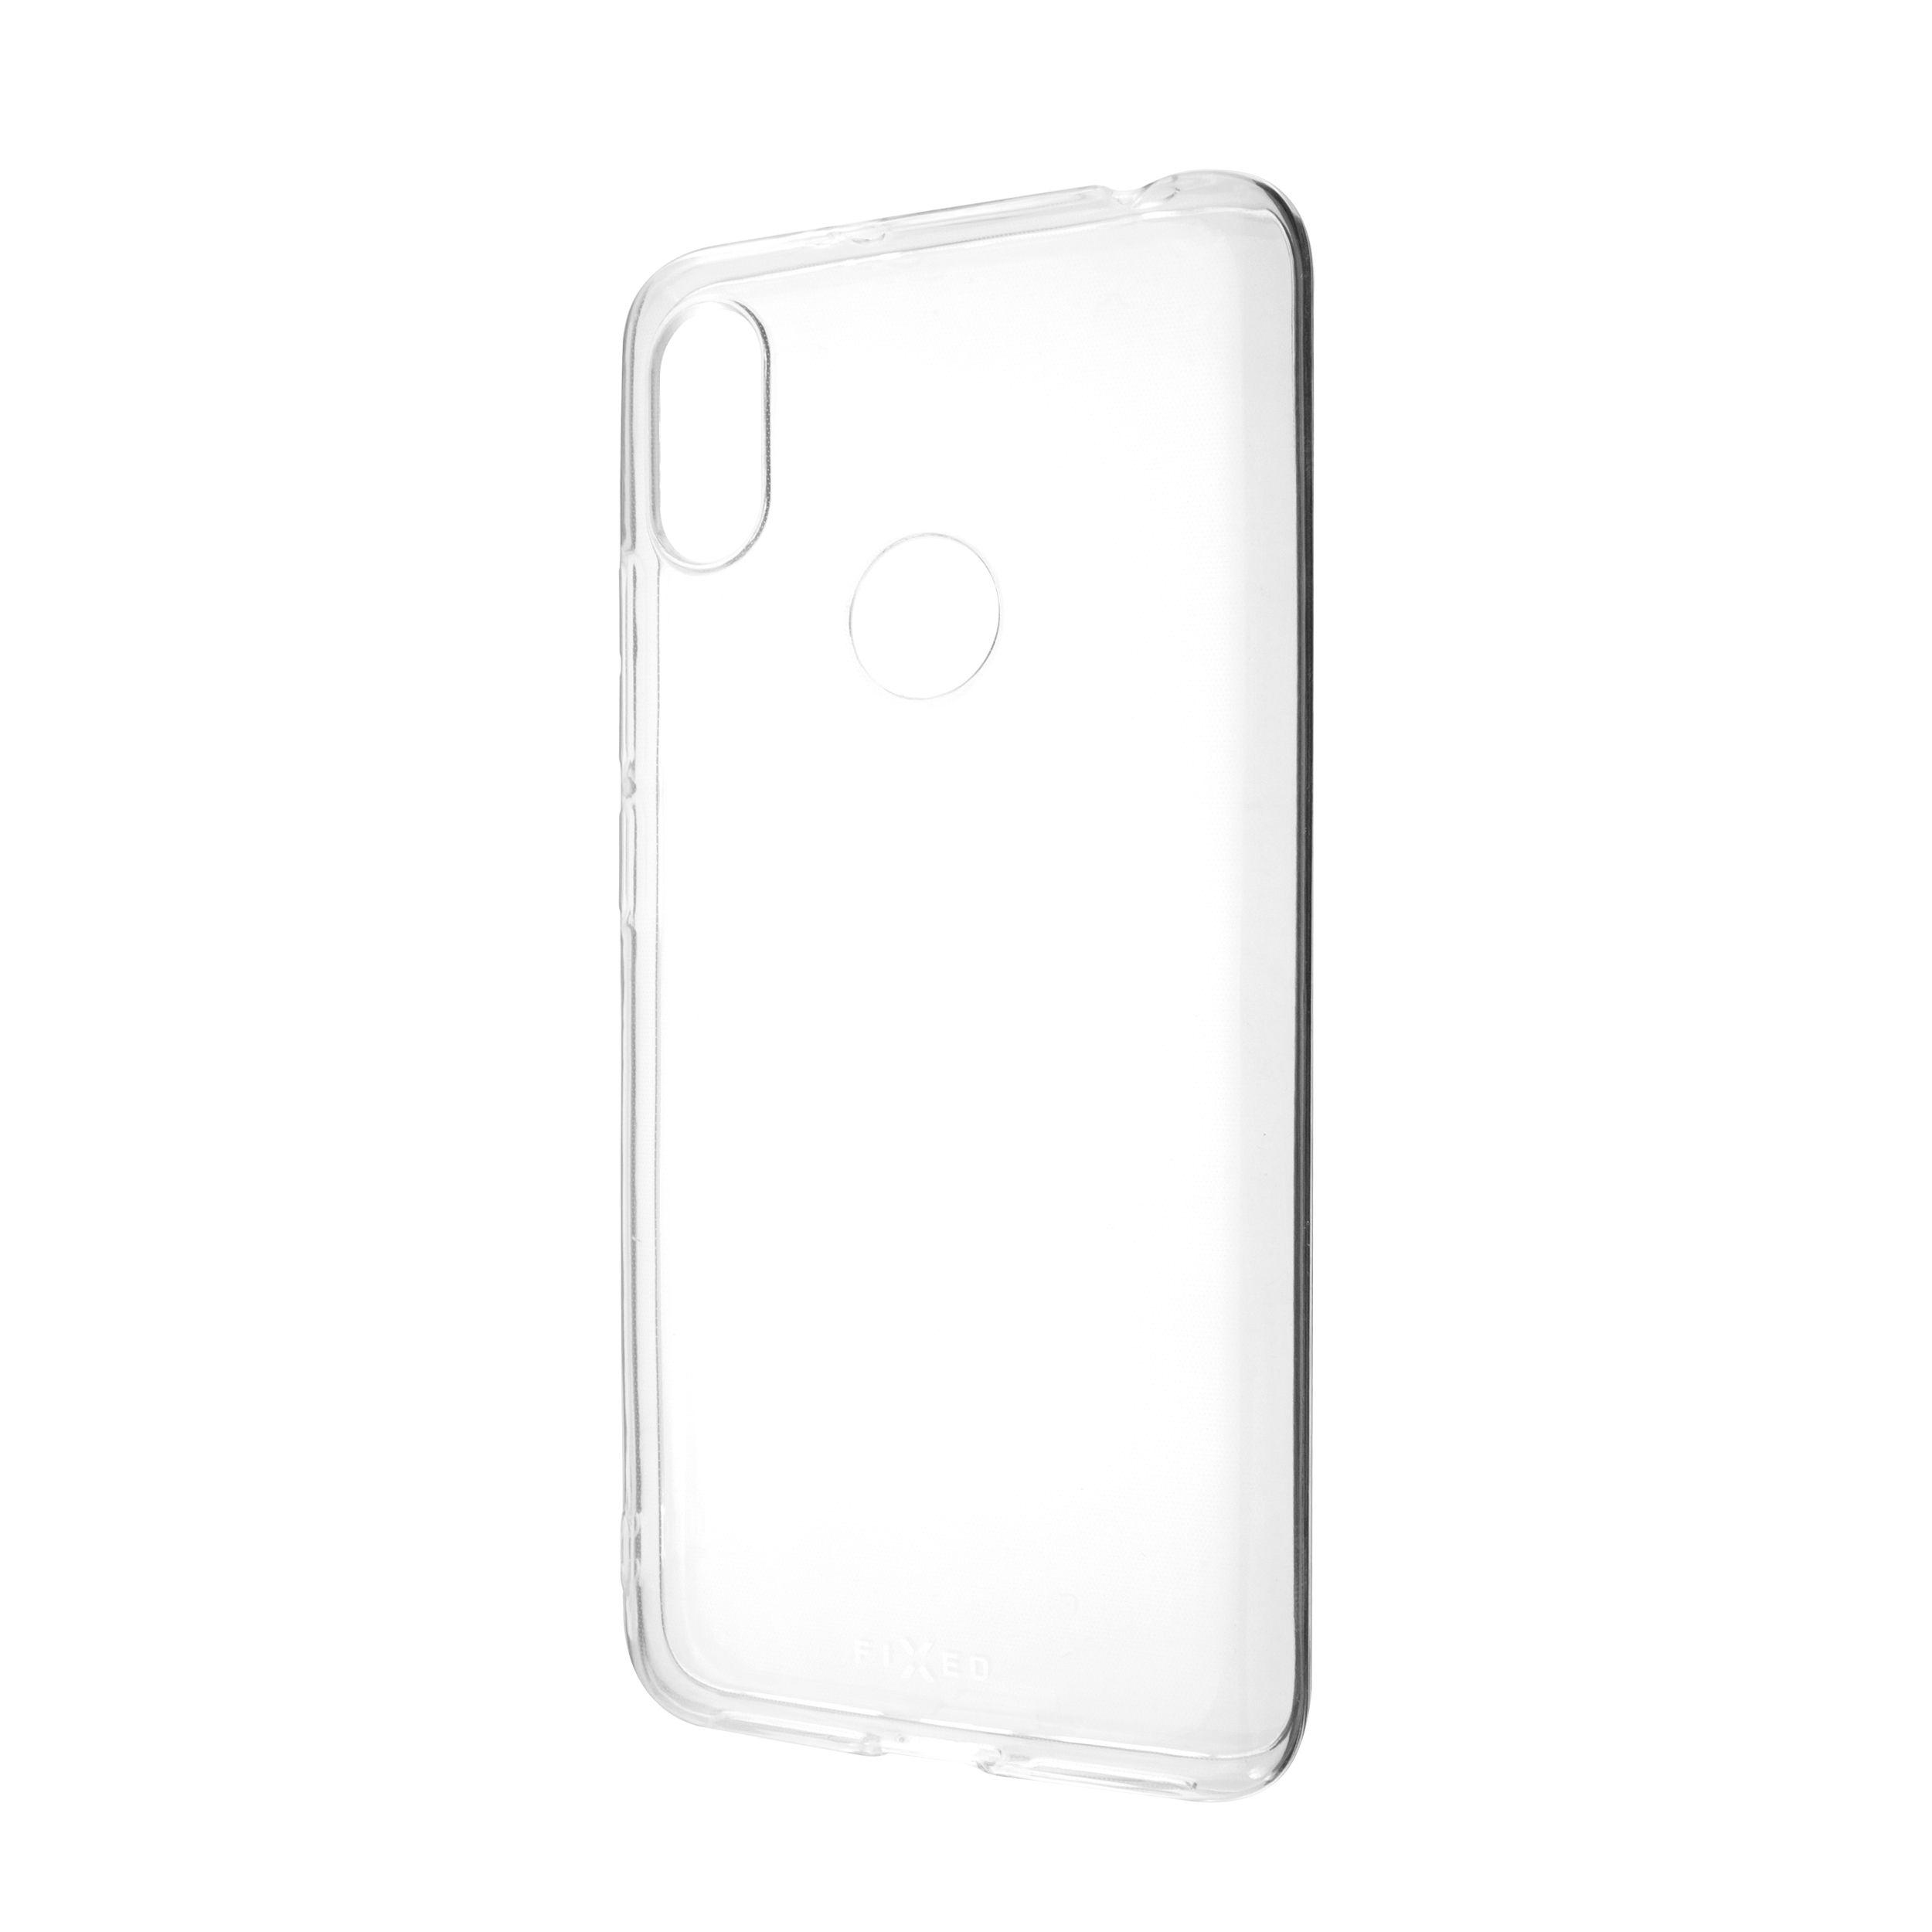 TPU gelové pouzdro FIXED pro Xiaomi Redmi S2, čiré